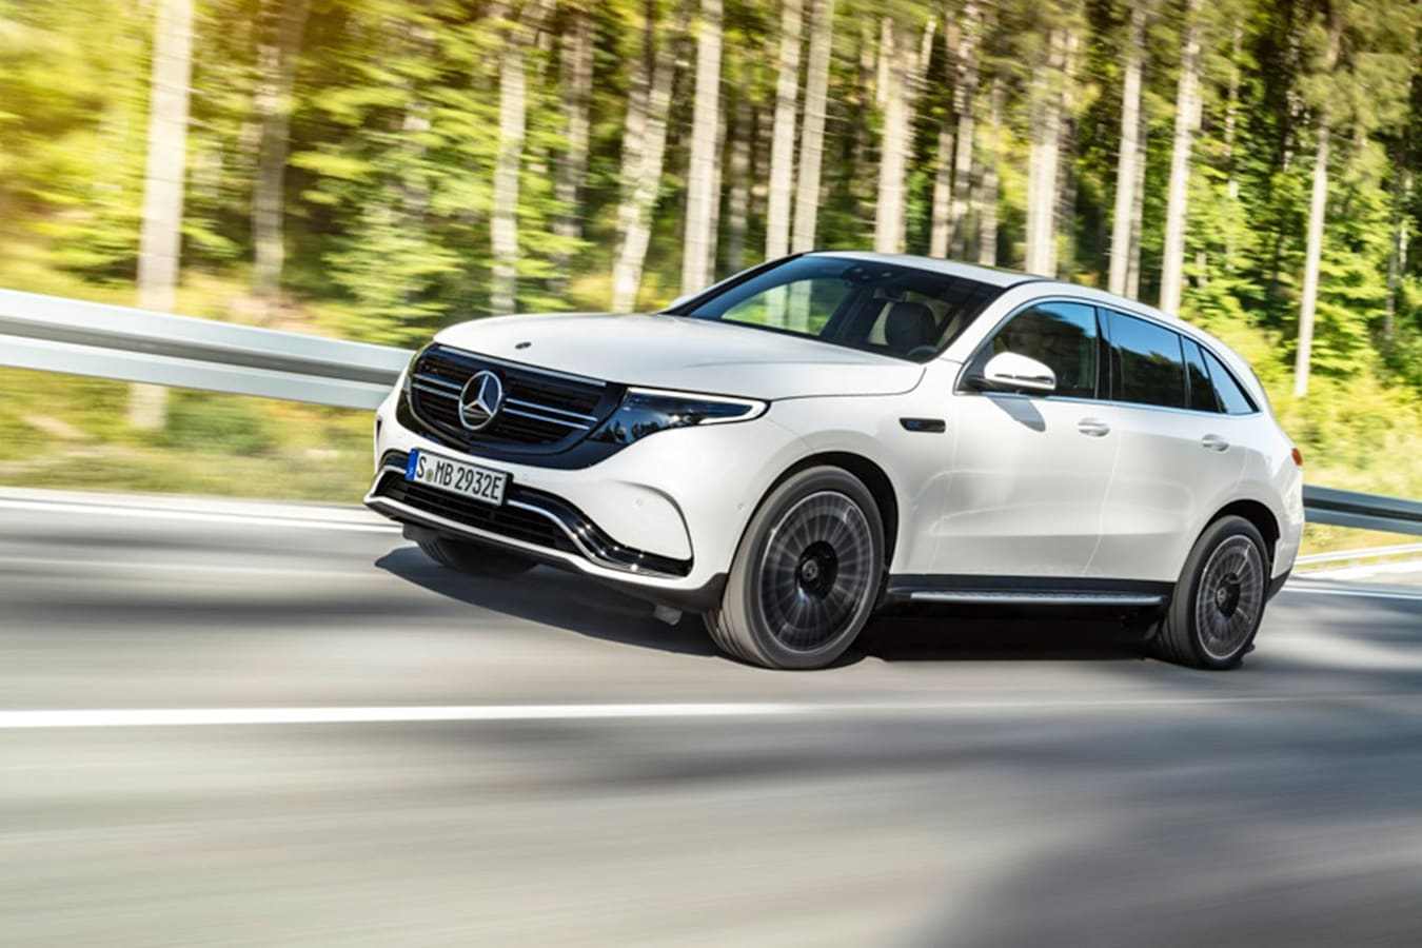 New Suvs Benz Jpg